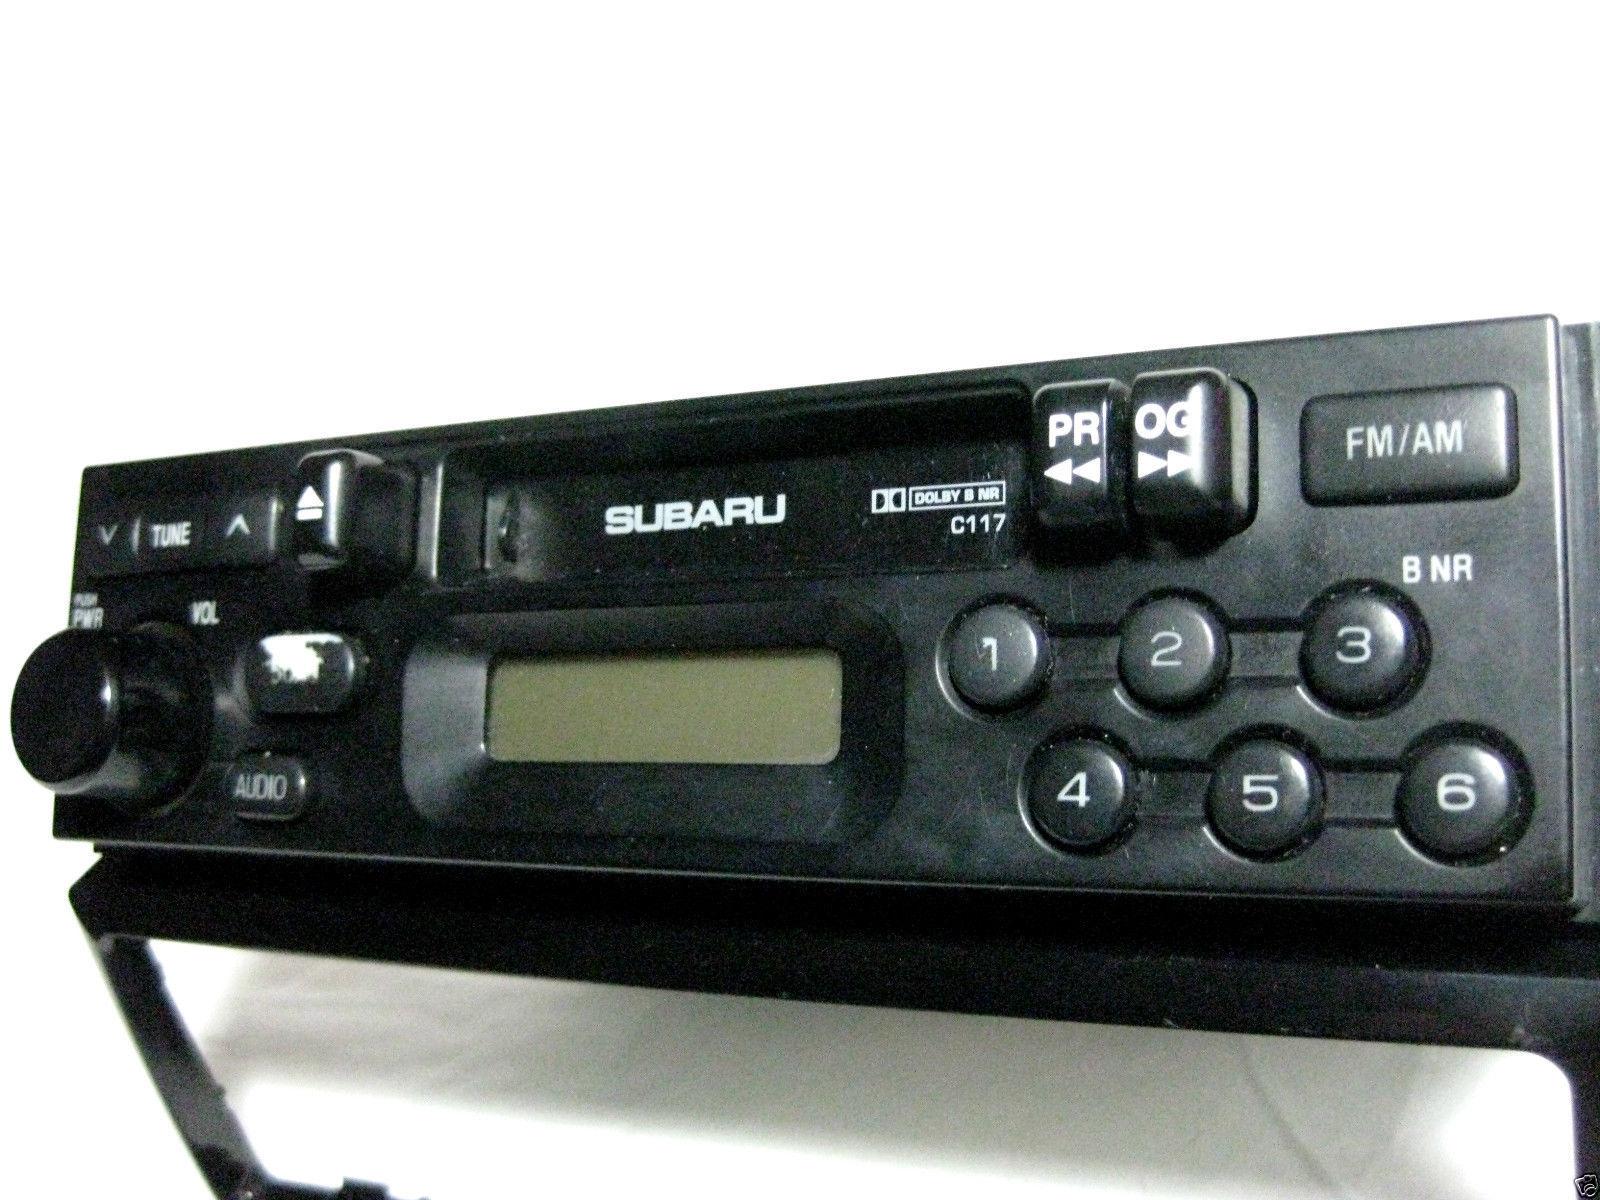 Subaru Legacy 2000 2001 Cassette player radio C117 Brighton & L models 57637g image 2